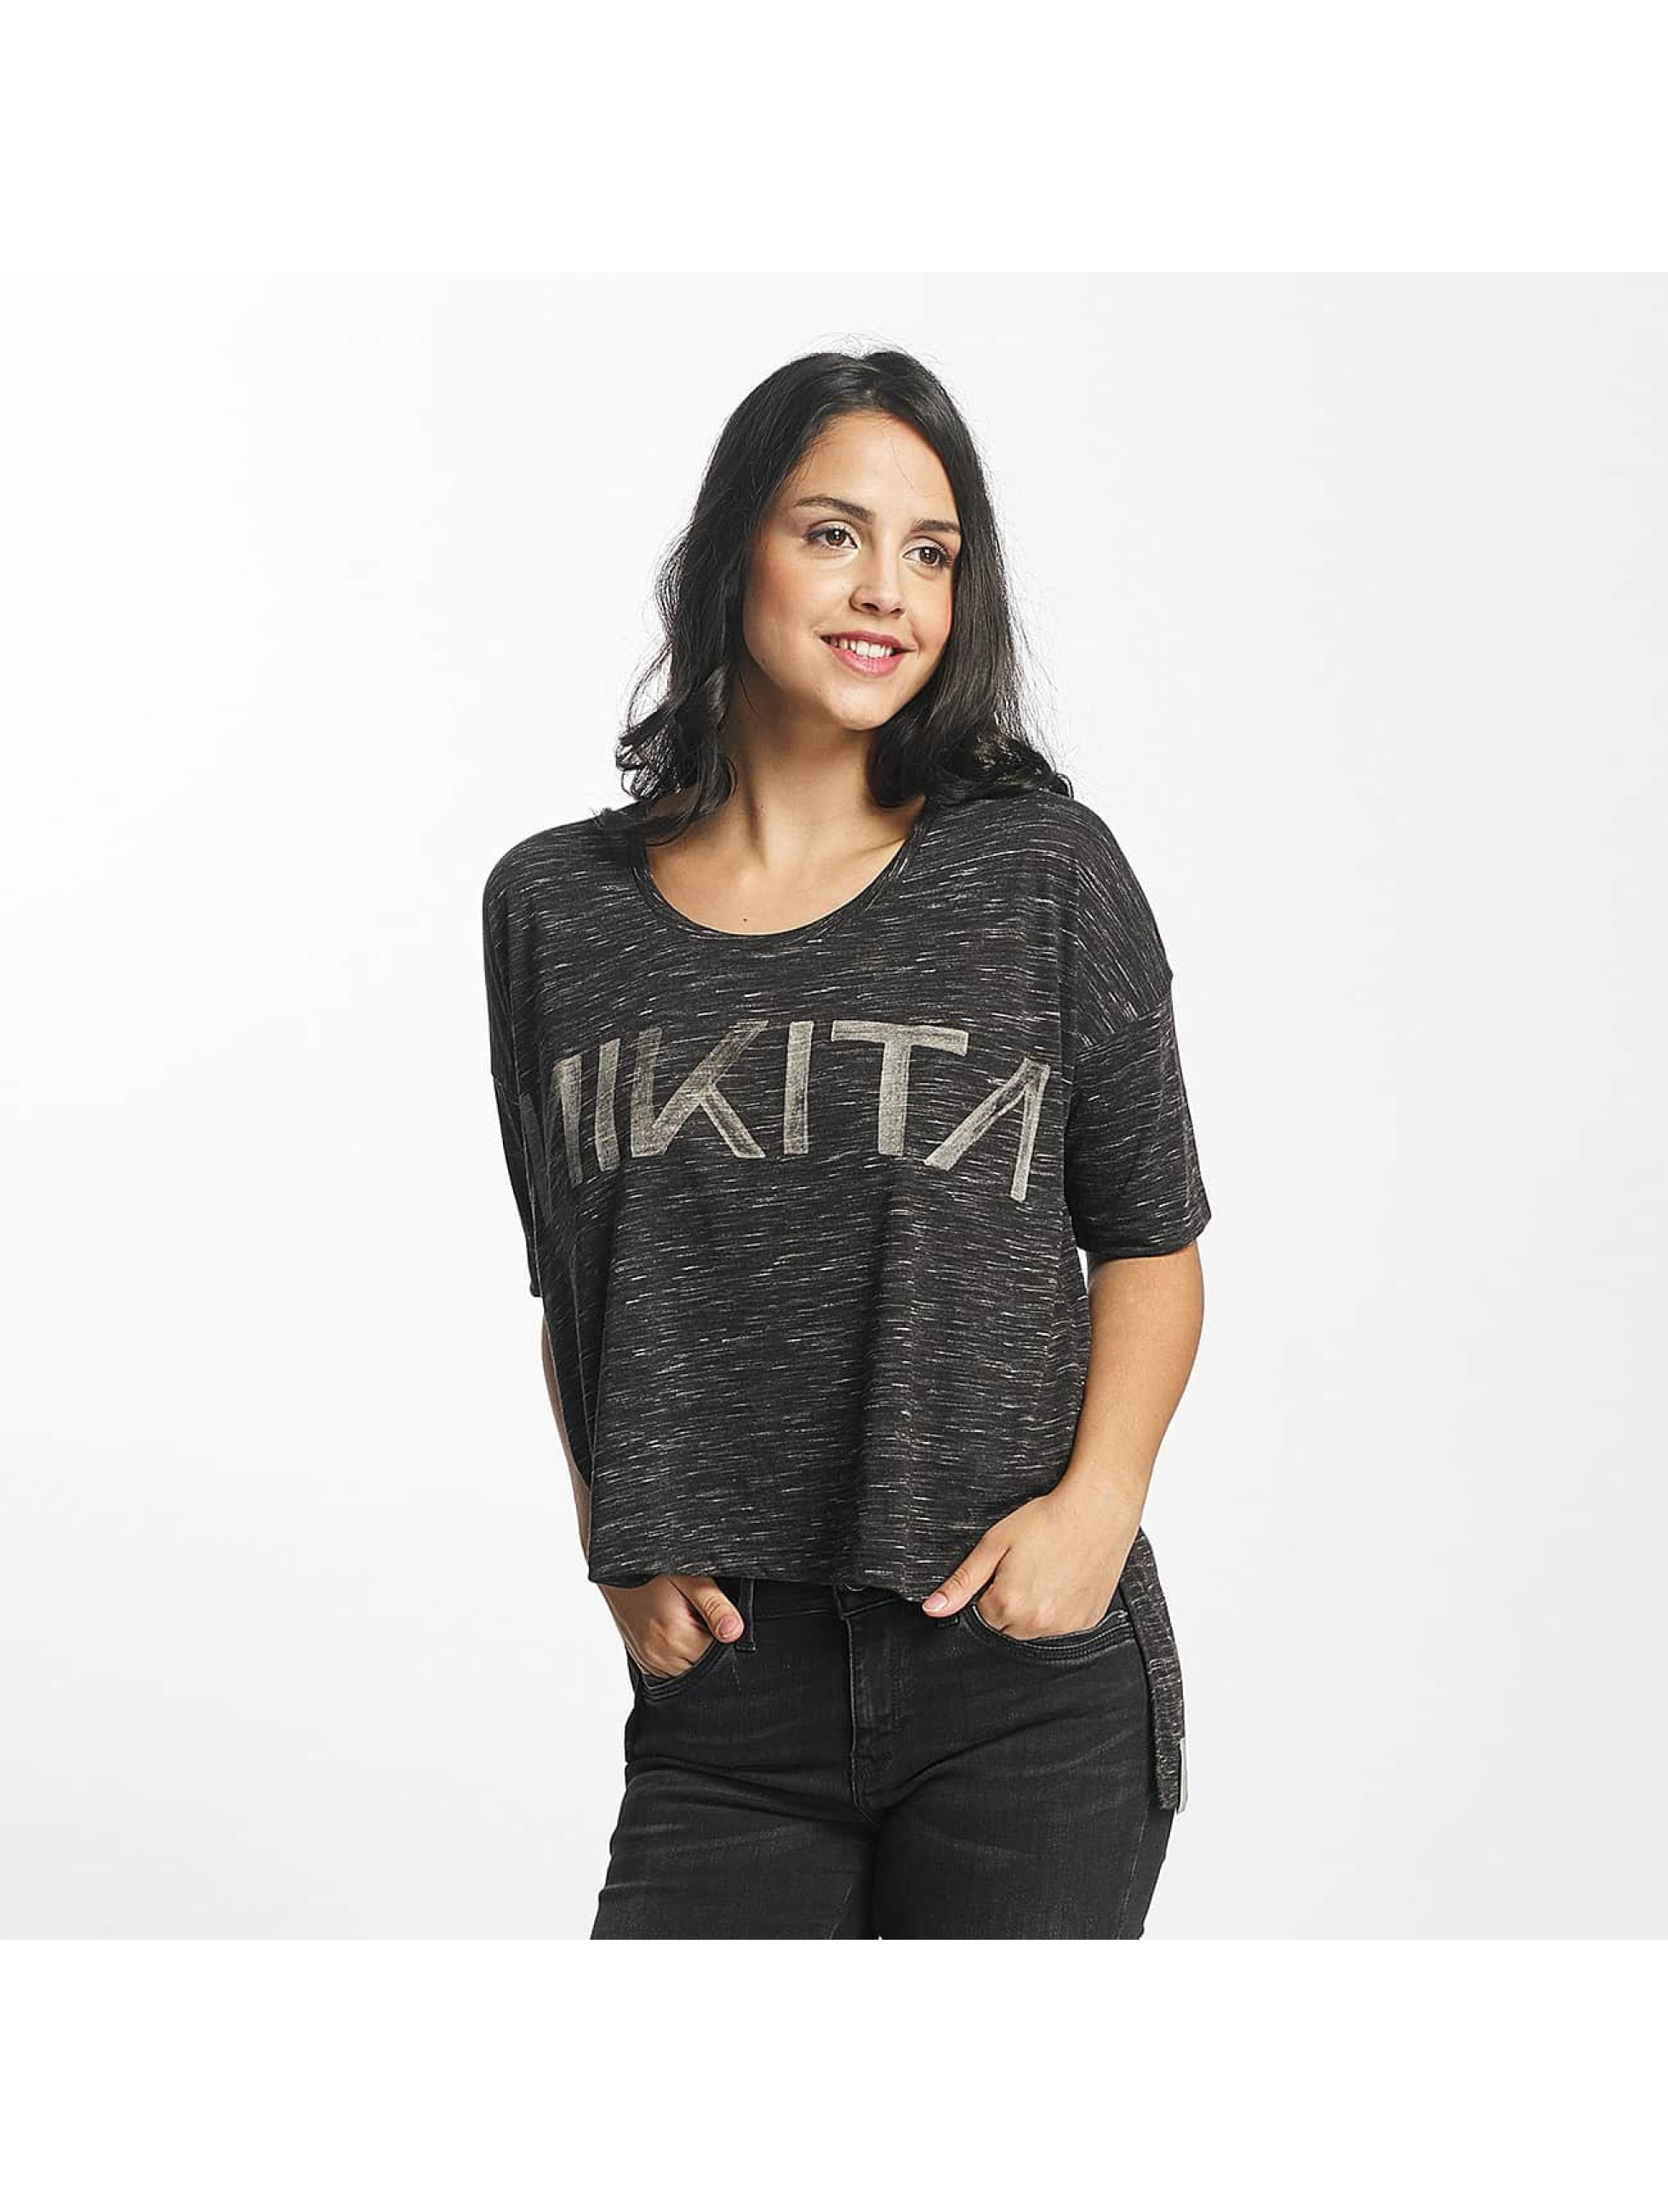 Nikita Frauen T-Shirt Letharia in schwarz